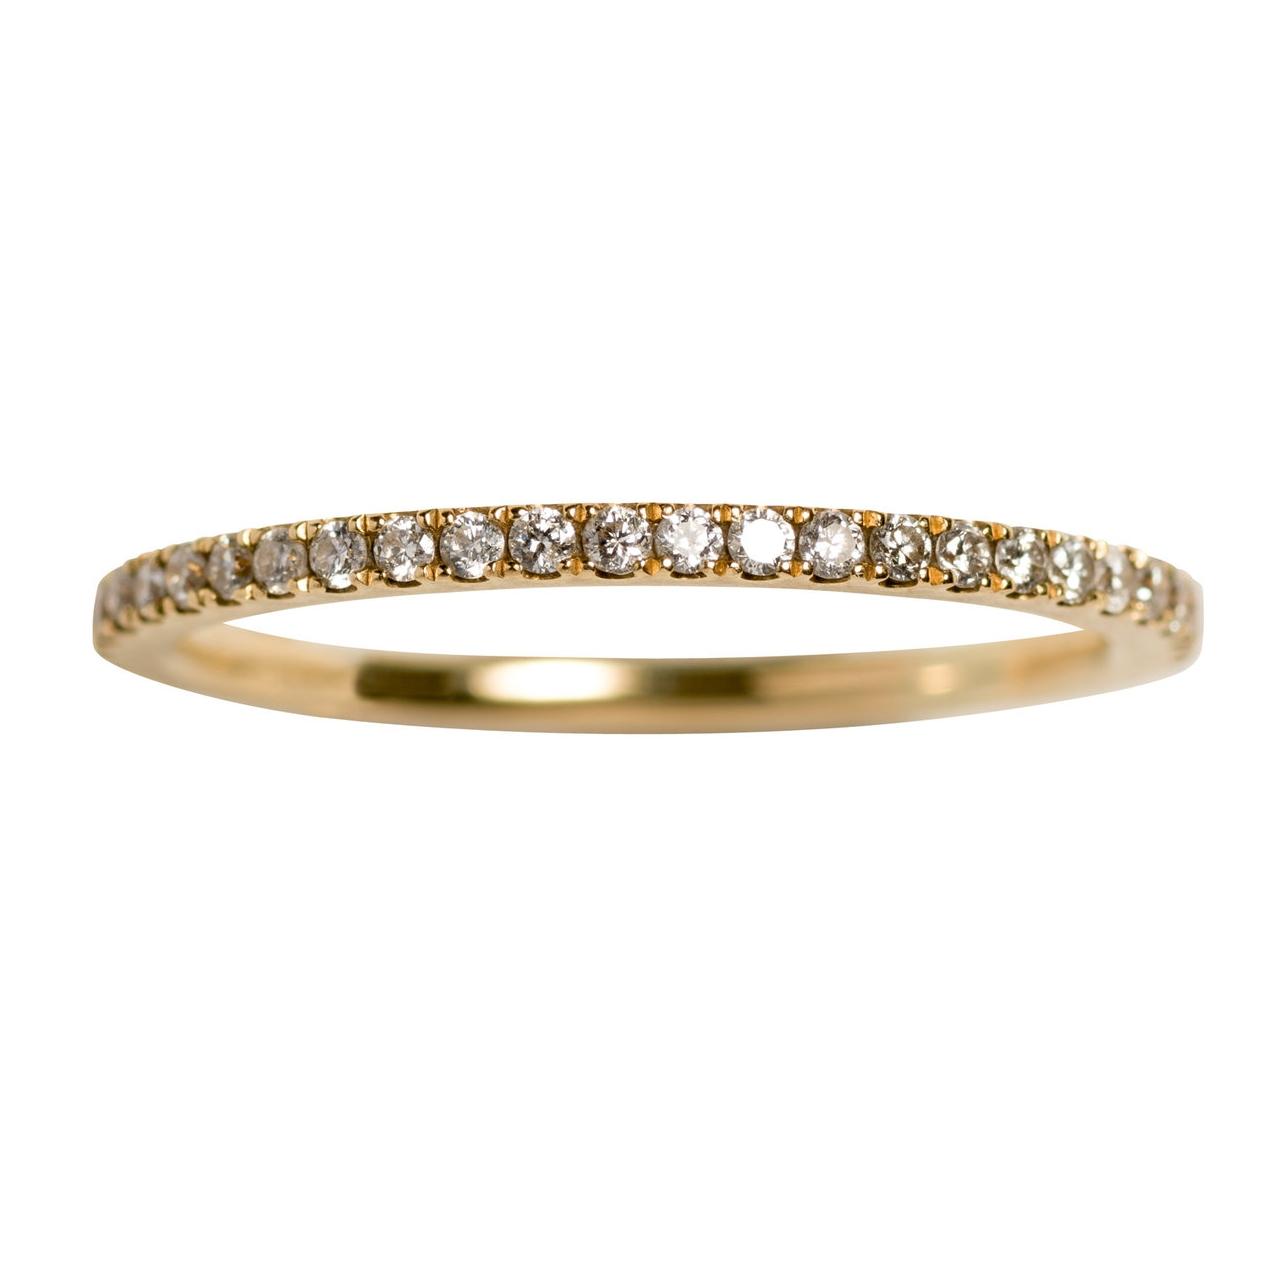 PETIT OLIVIA WEDDING RING - 17.500 NOK. 18 ct yellow gold. 0,33 ct diamonds.